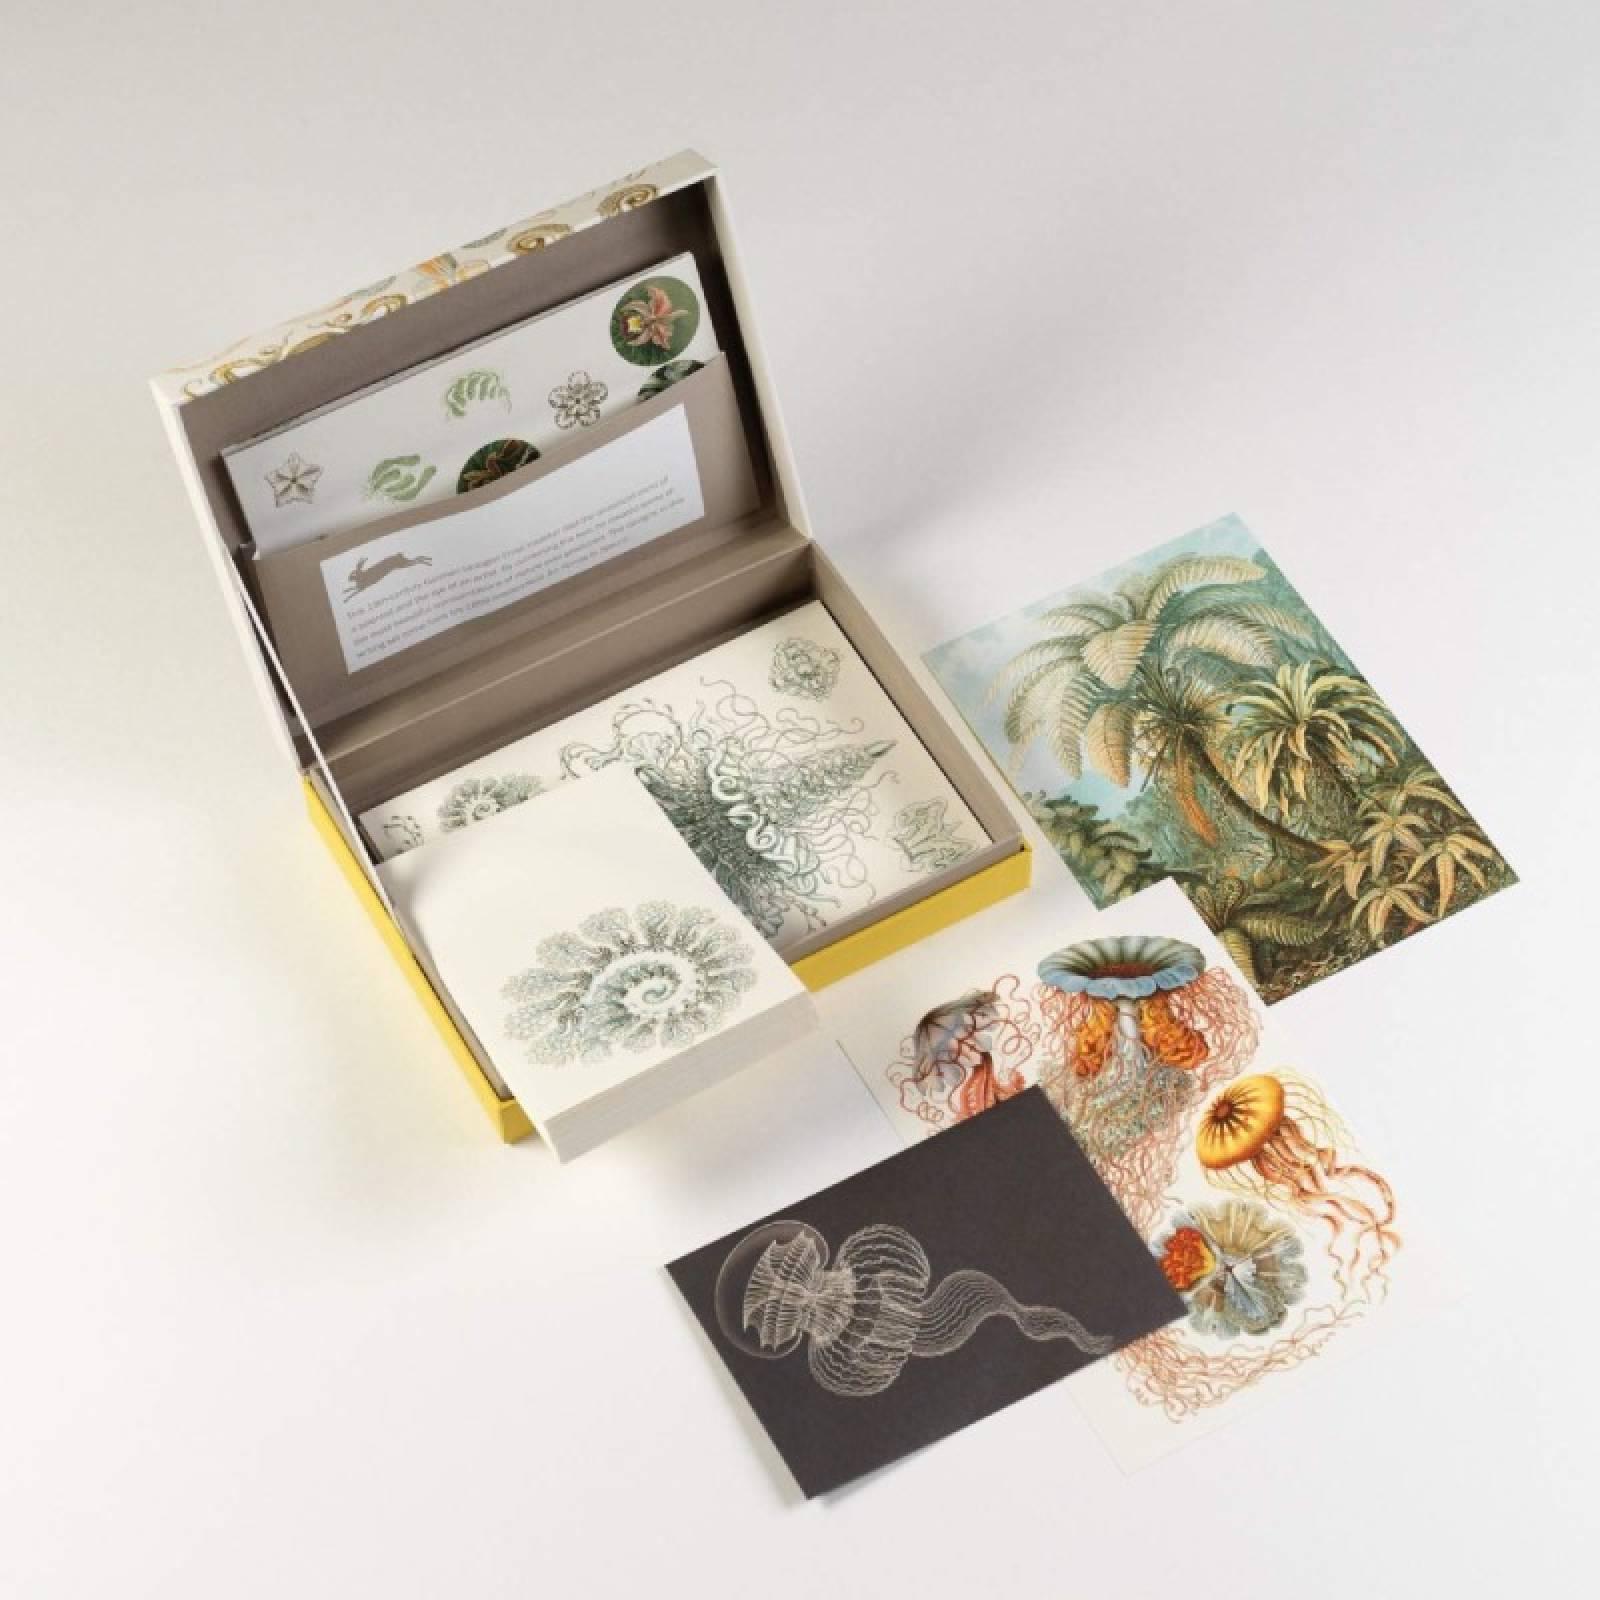 Artforms In Nature - Letter Writing Set thumbnails